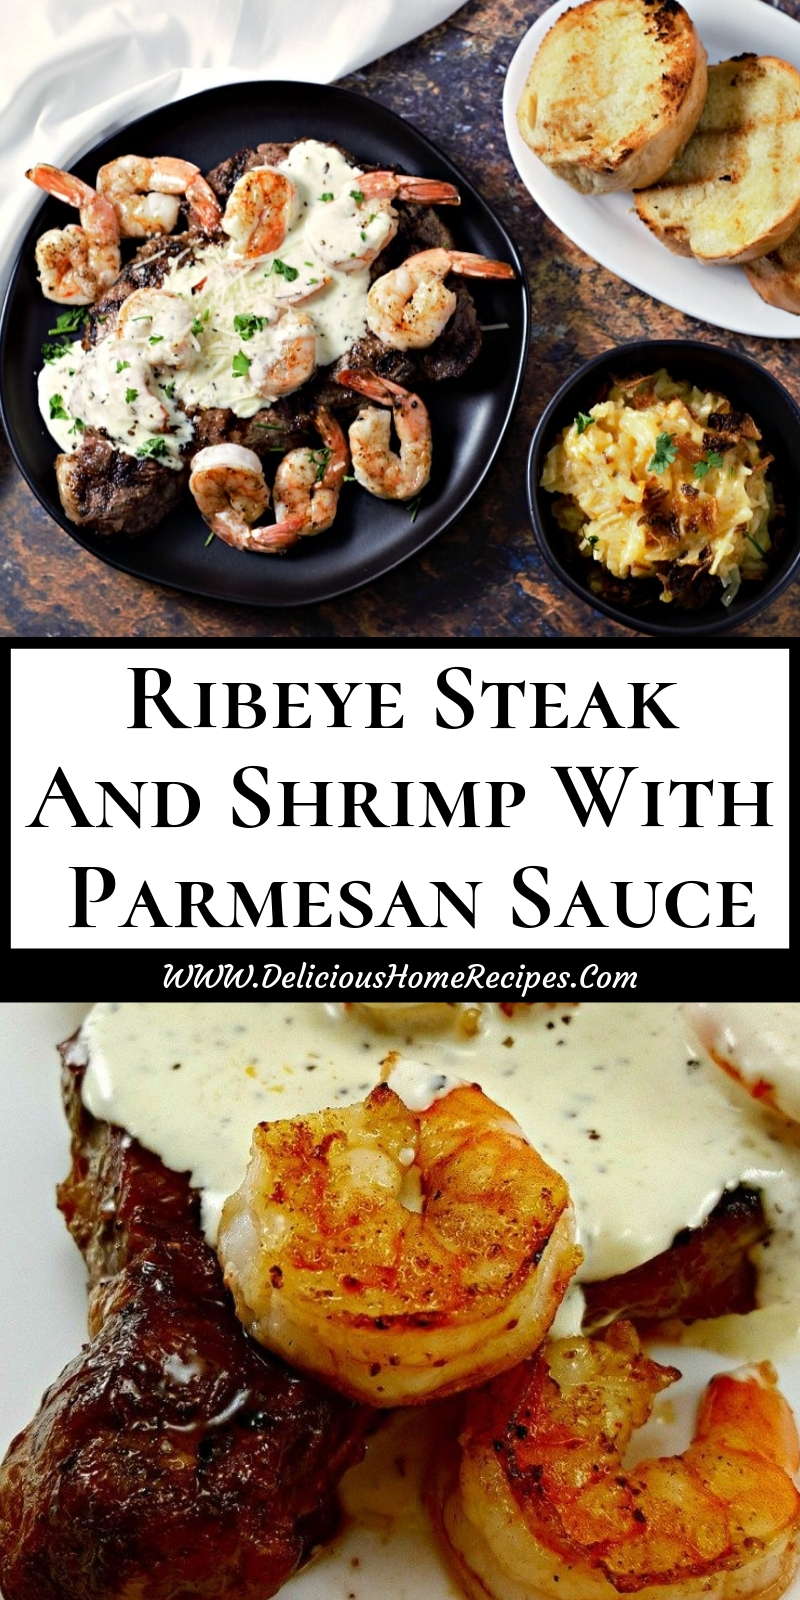 Ribeye Steak And Shrimp With Parmesan Sauce